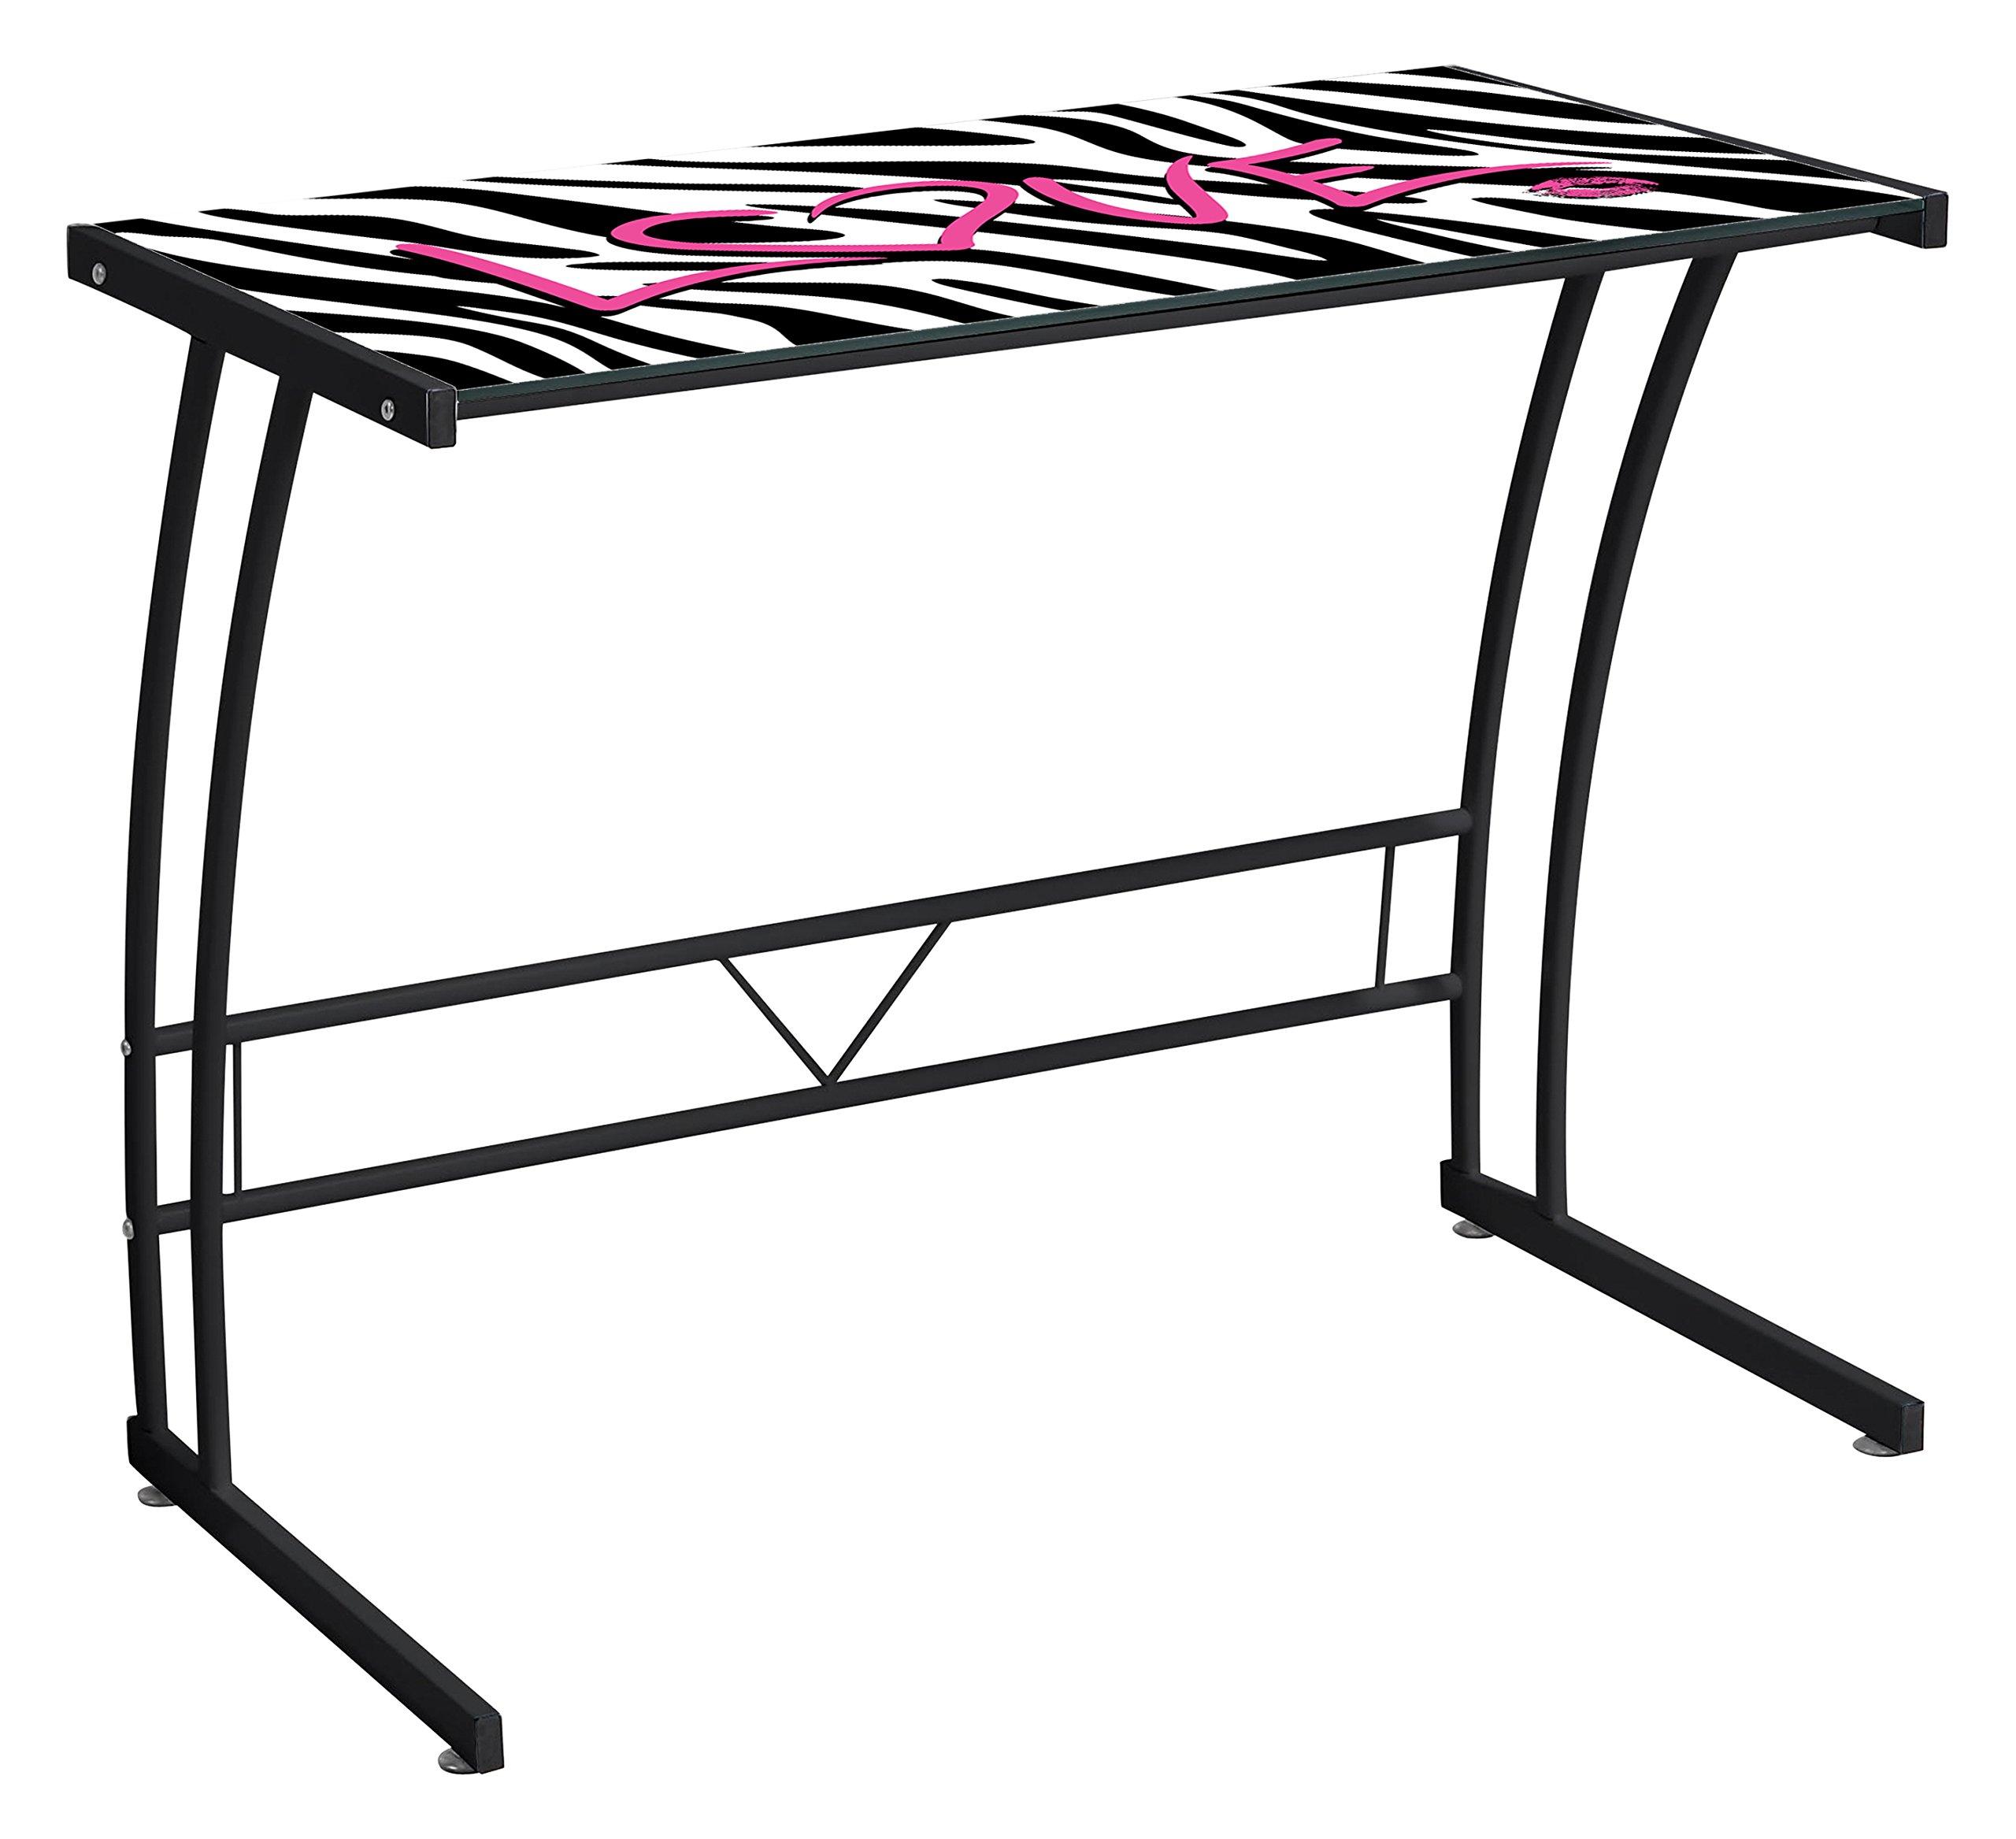 LumiSource OFD-TM-BITSGL Z Sigma Graphic Desk Contemporary, Black Frame/Zebra Love